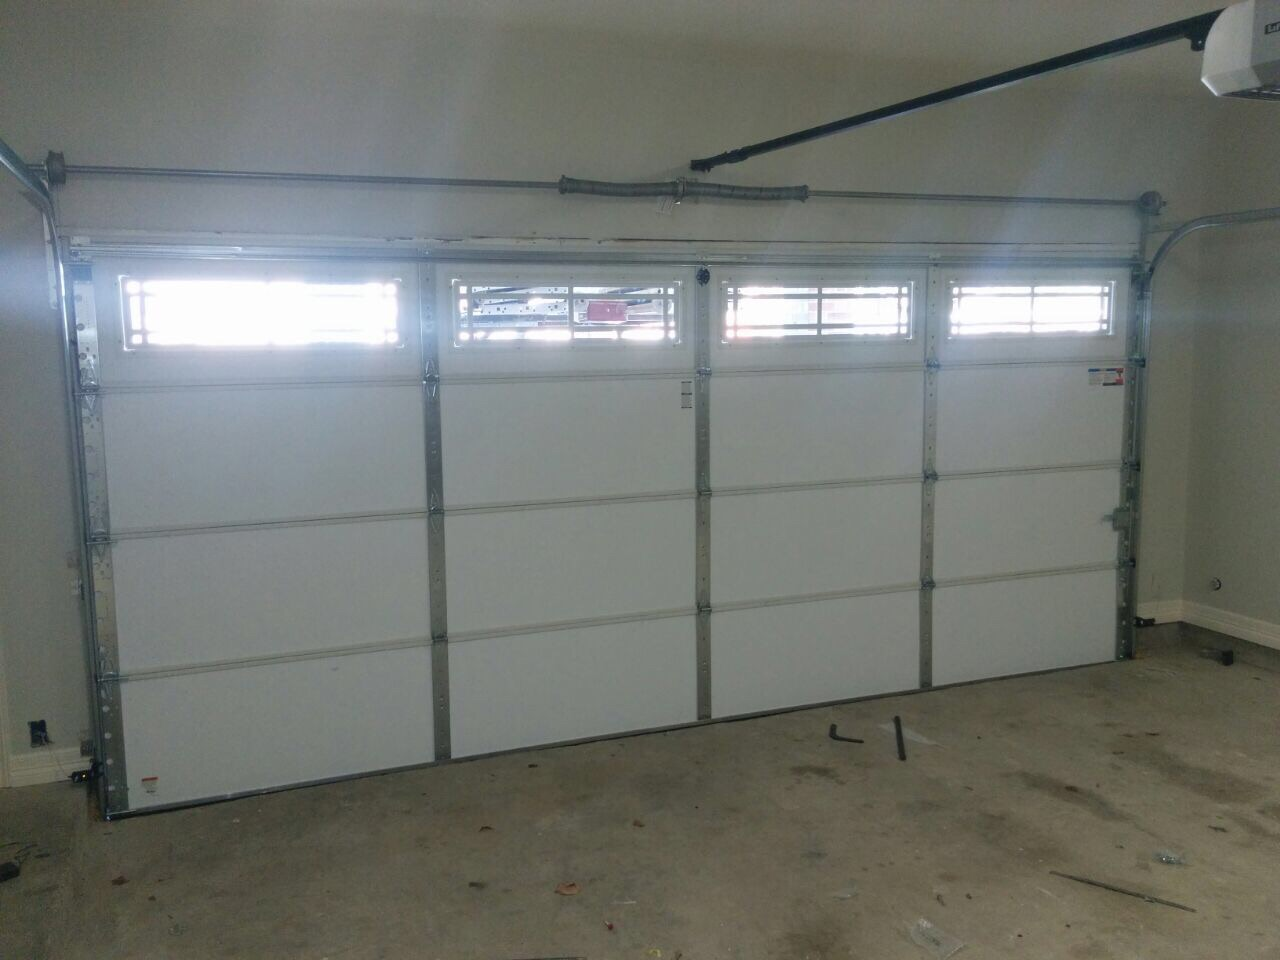 Liftmaster opener service garage door repair lynnwood wa for Fort lauderdale garage door repair